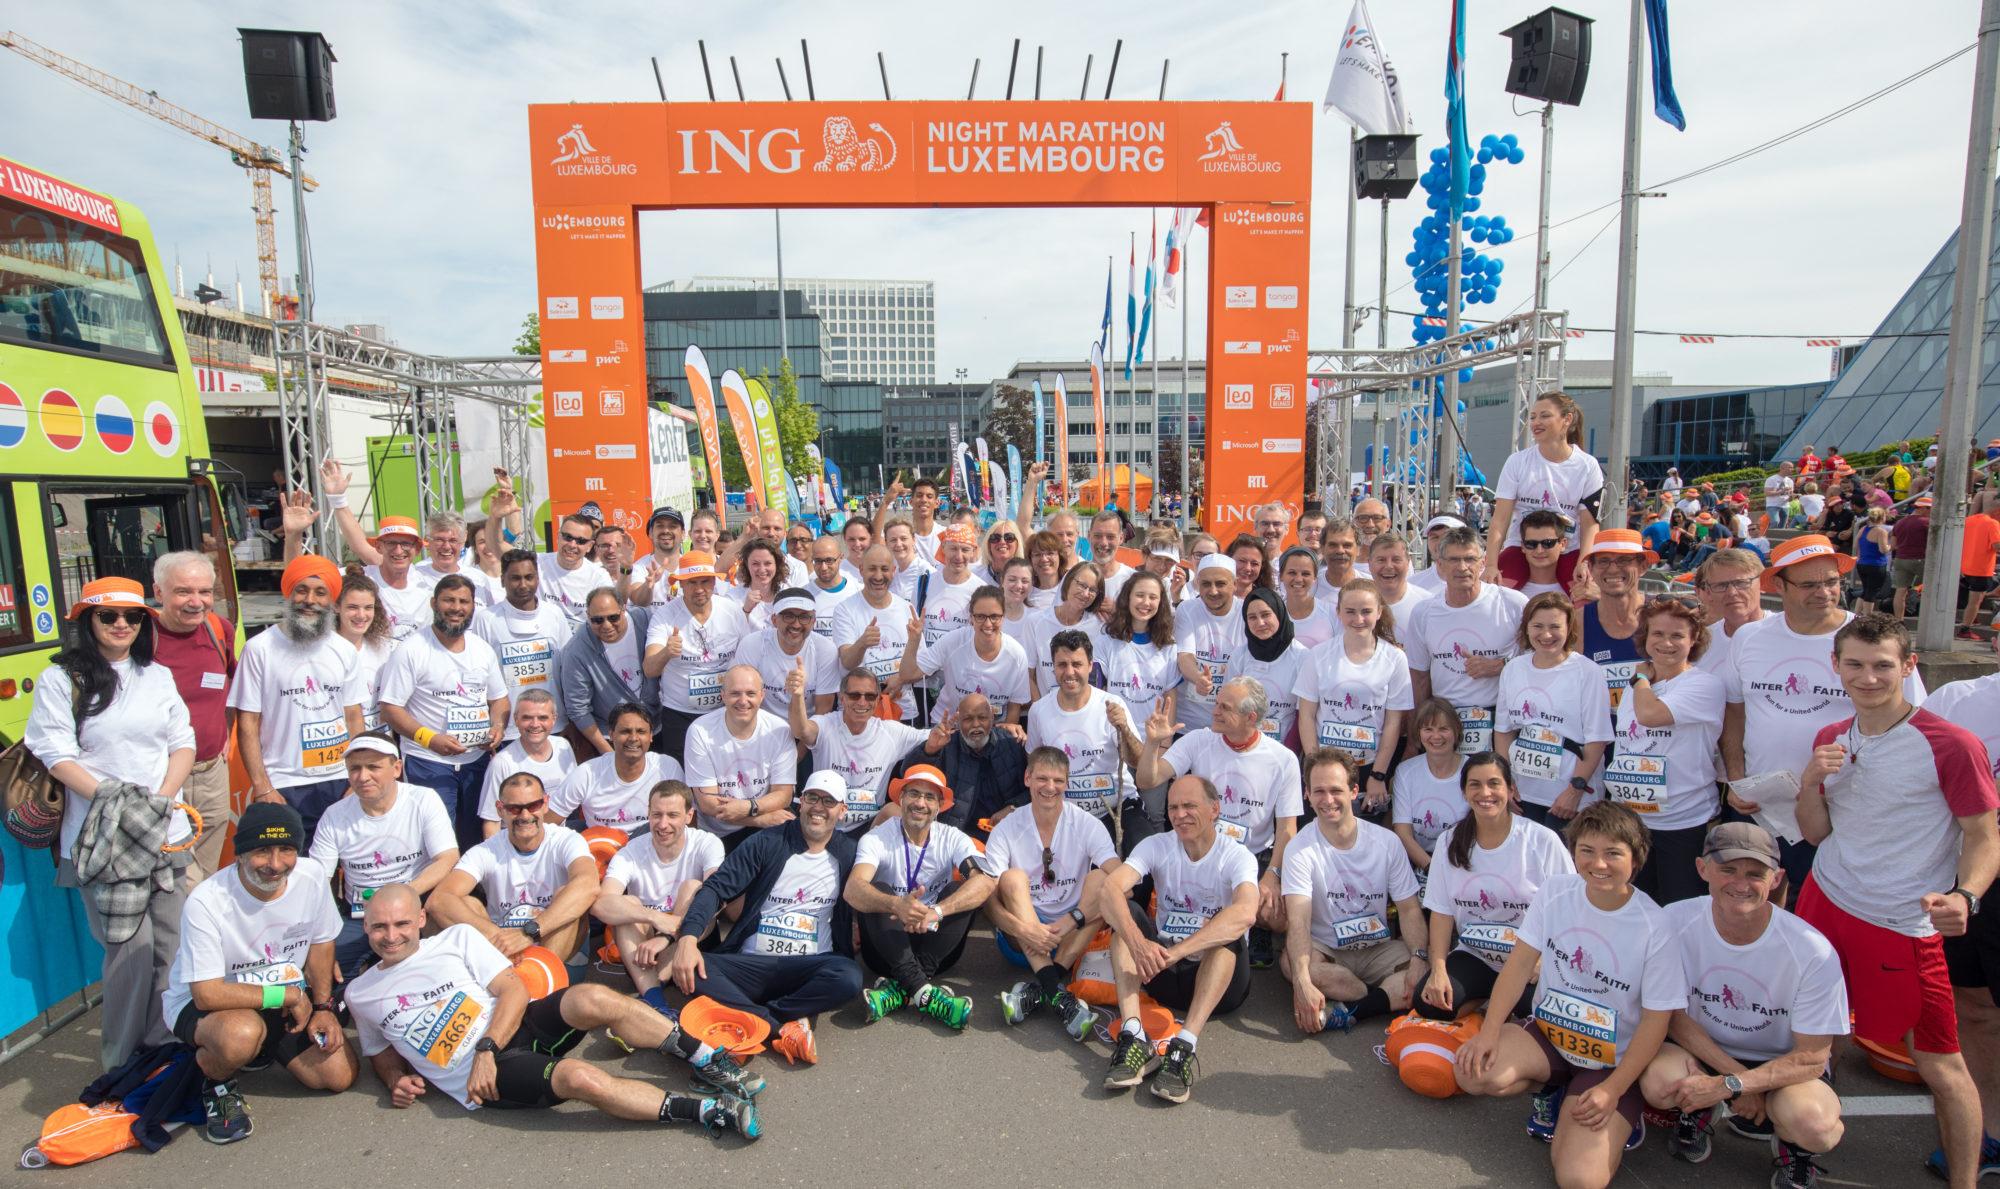 Interfaith - Run for a United World